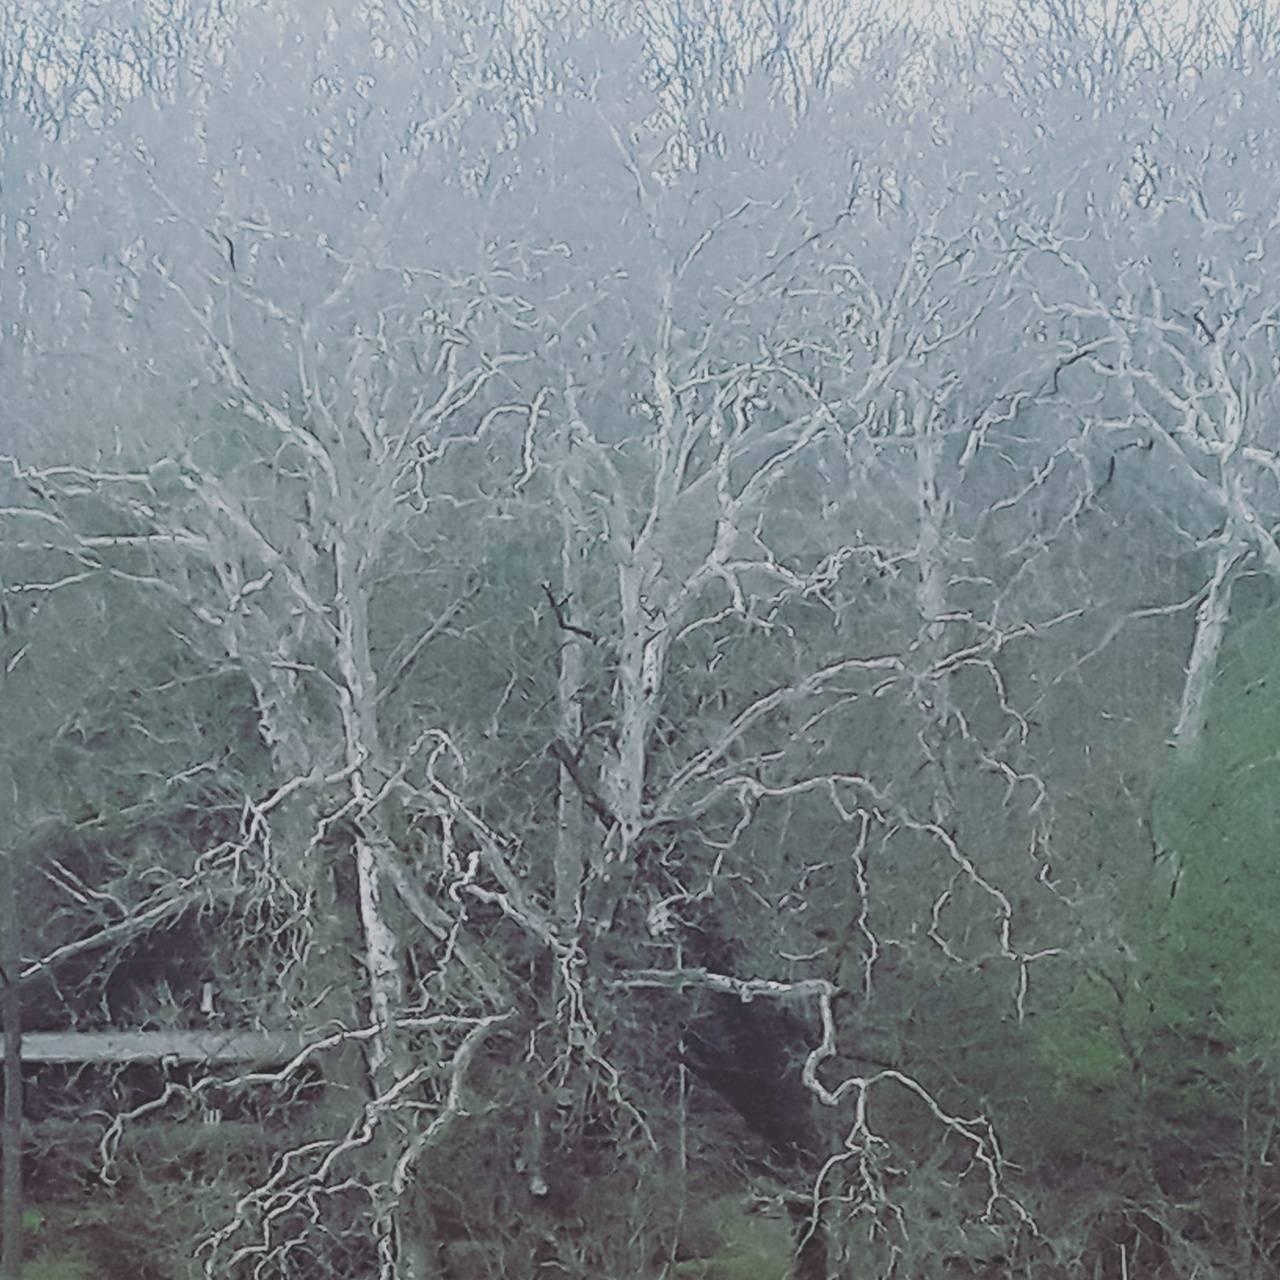 Tvd white Oak tree